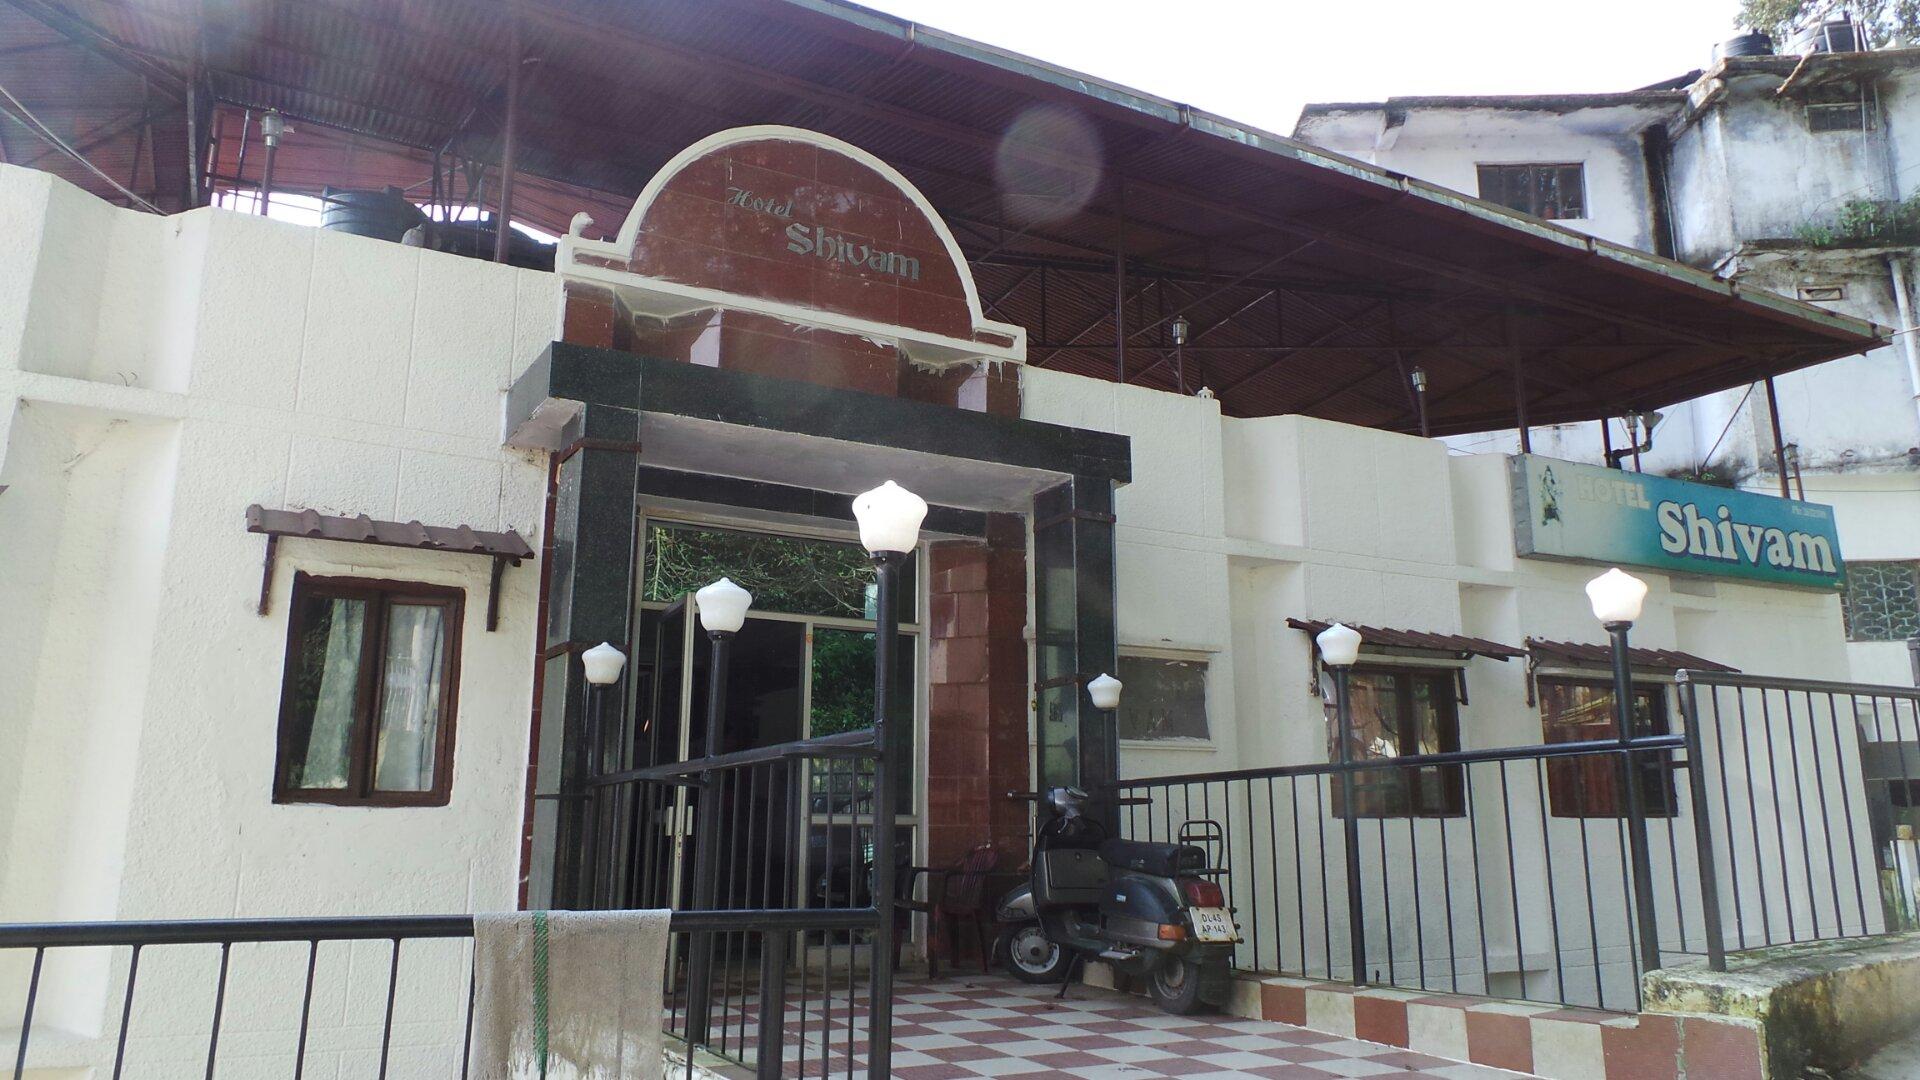 Hotel Shivam in Mussoorie